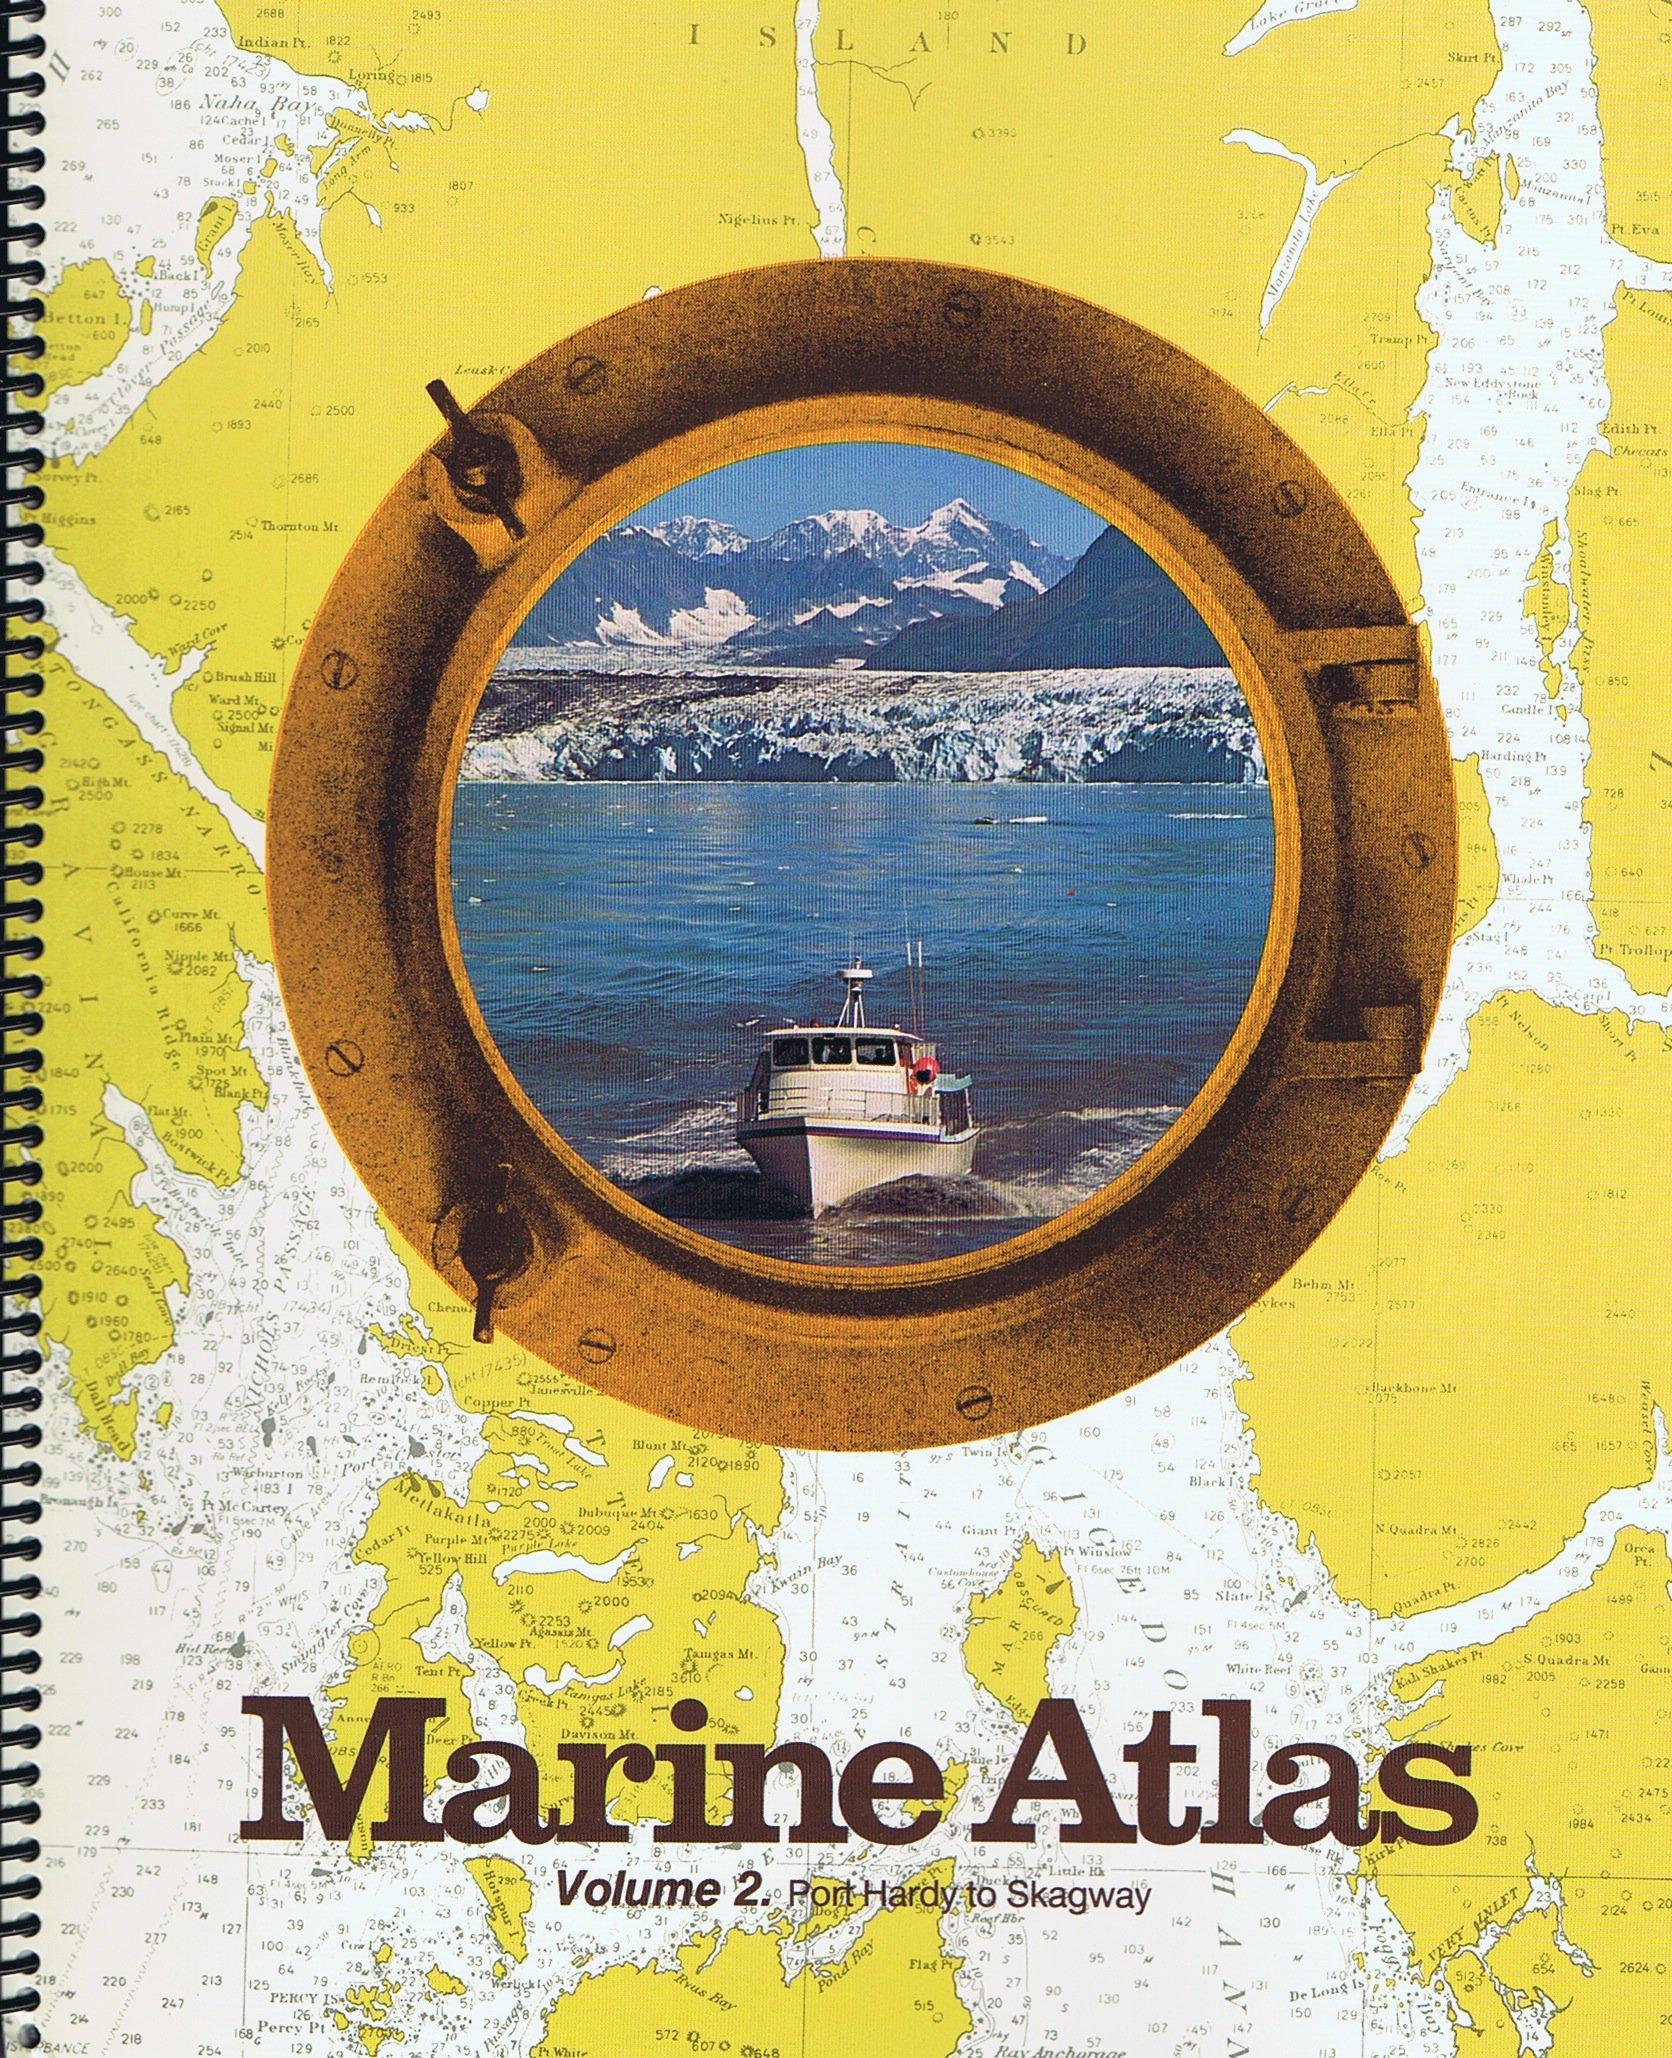 Marine Atlas- Vol. 2 - Port Hardy to Skagway by Brand: FineEdge.com LLC